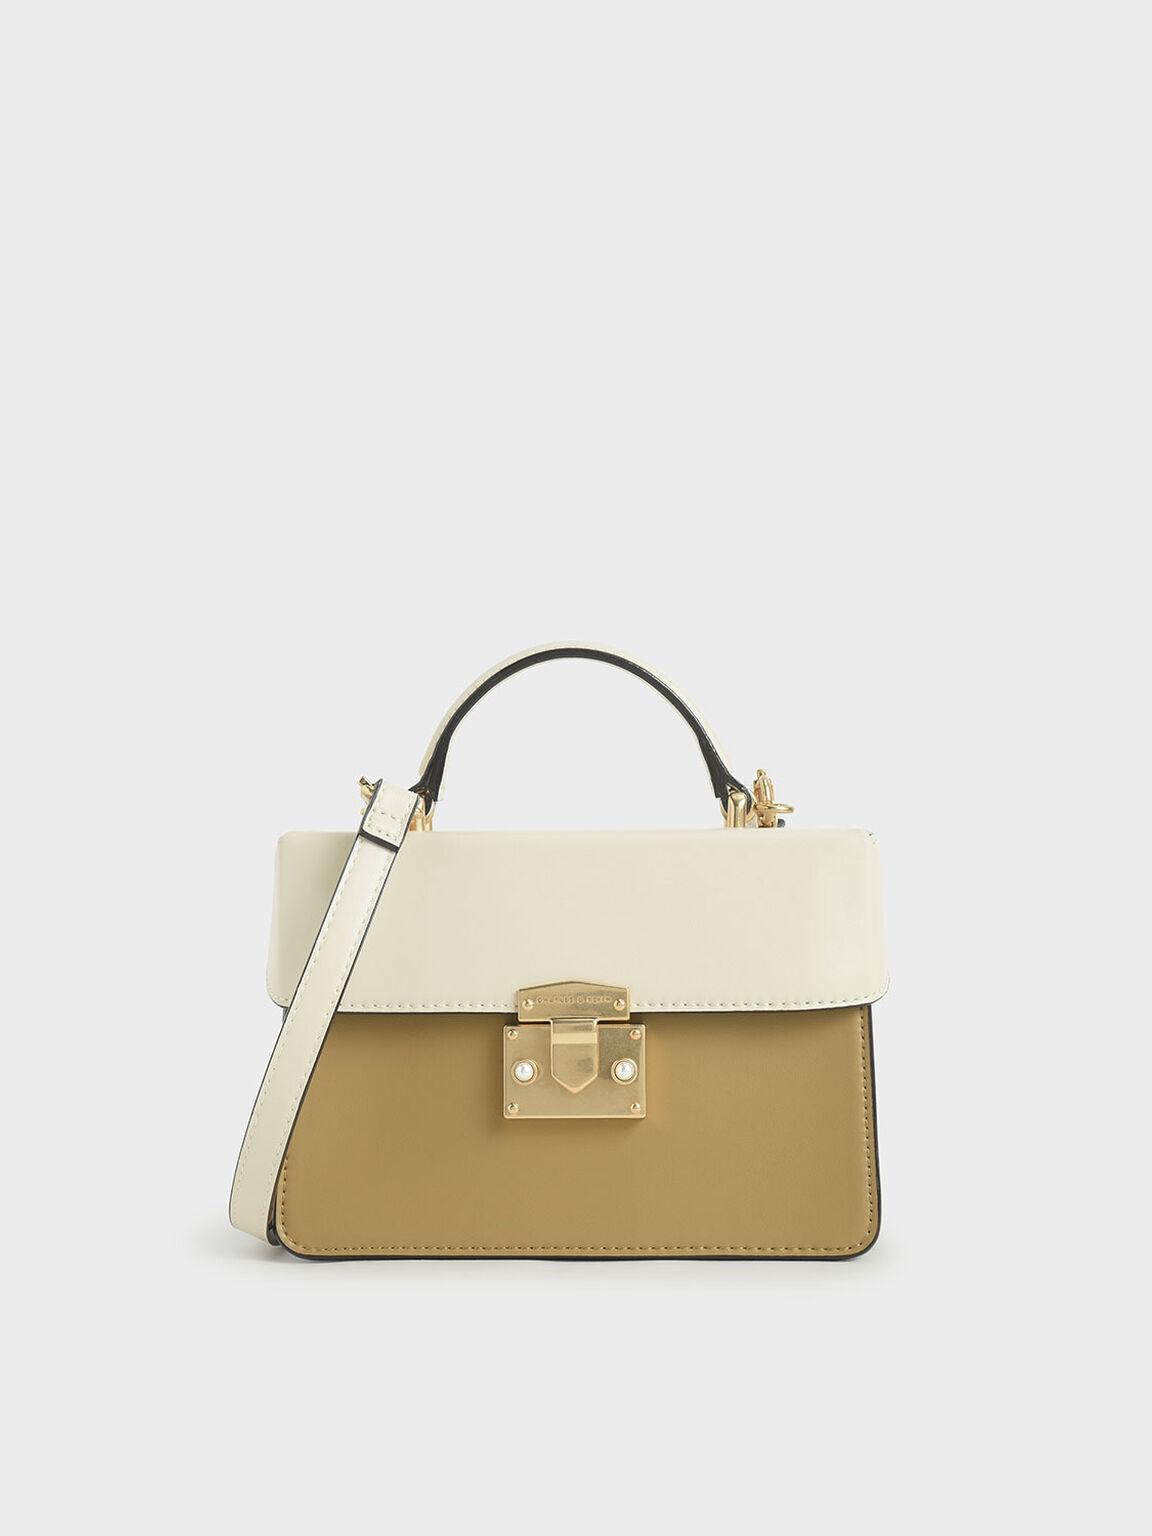 Two-Tone Metallic Push-Lock Handbag, Multi, hi-res